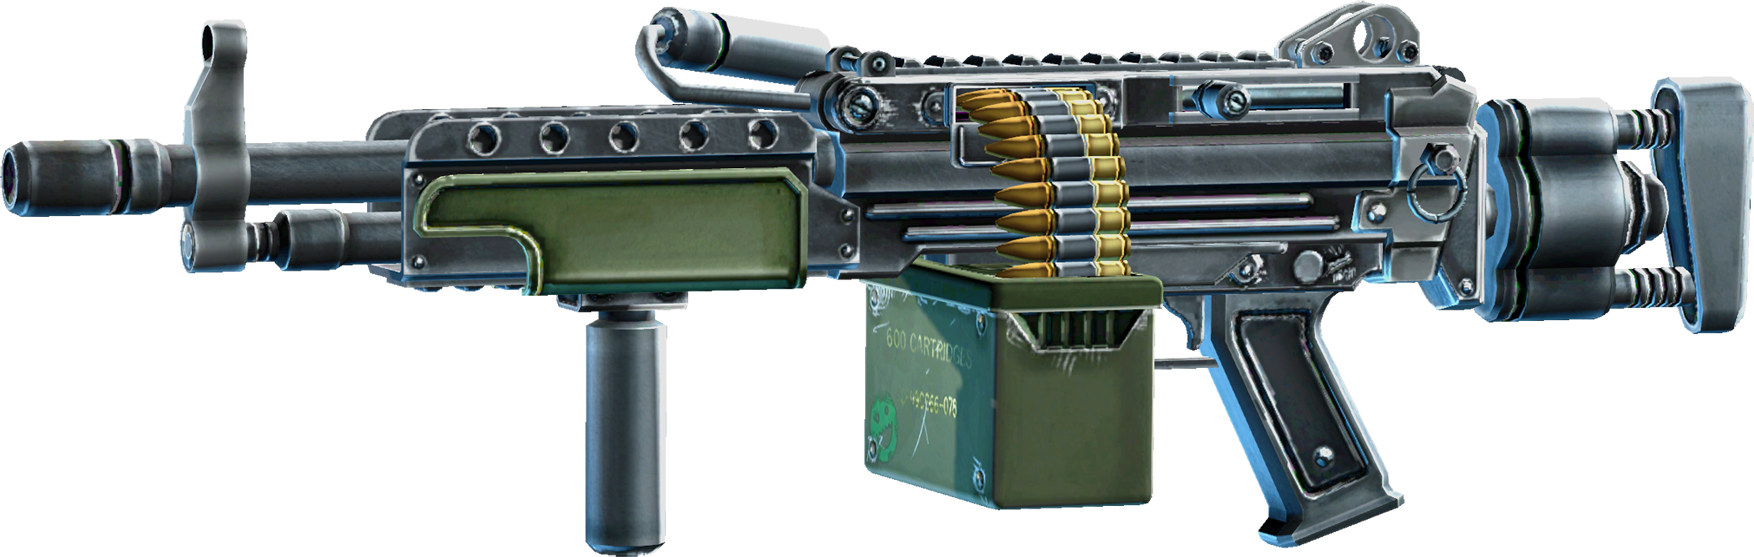 SRIV Rifles - Automatic Rifle - Mercenary LMG - Default.png - Big Guns PNG